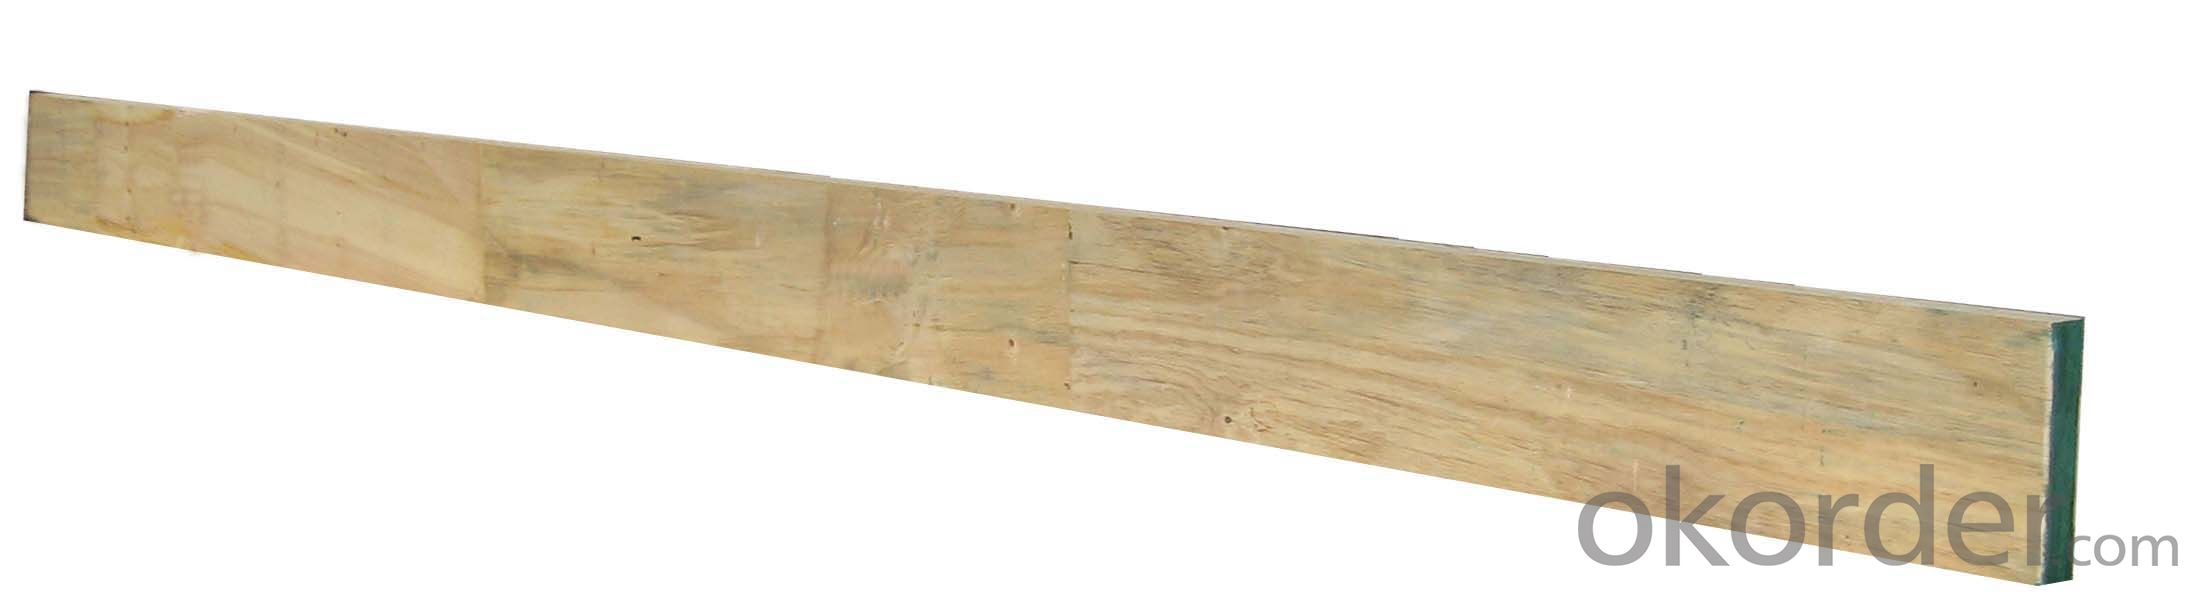 Radiate pine LVL Scaffolding Plank/Board for construction